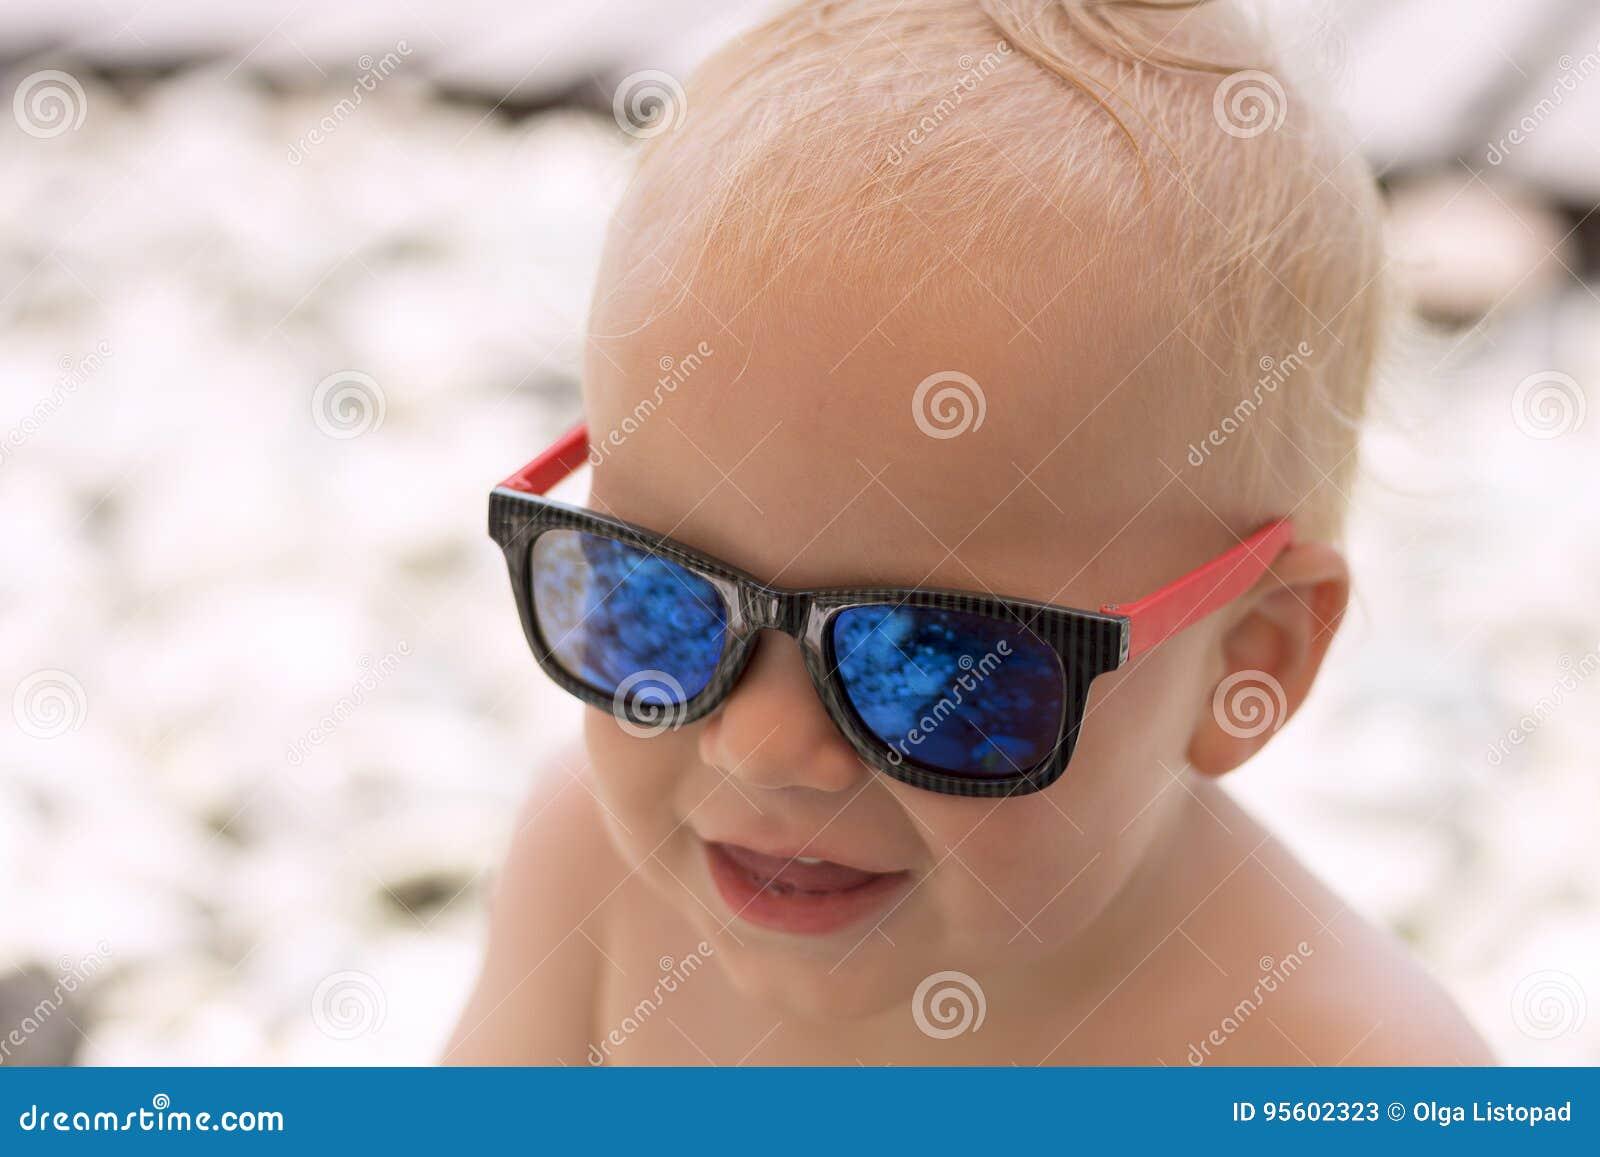 f4e0320d17 Αστείο χαμογελώντας αγοράκι στα γυαλιά ηλίου στην παραλία Οι πέτρες  απεικονίζονται στα γυαλιά Λίγος προϊστάμενος στις